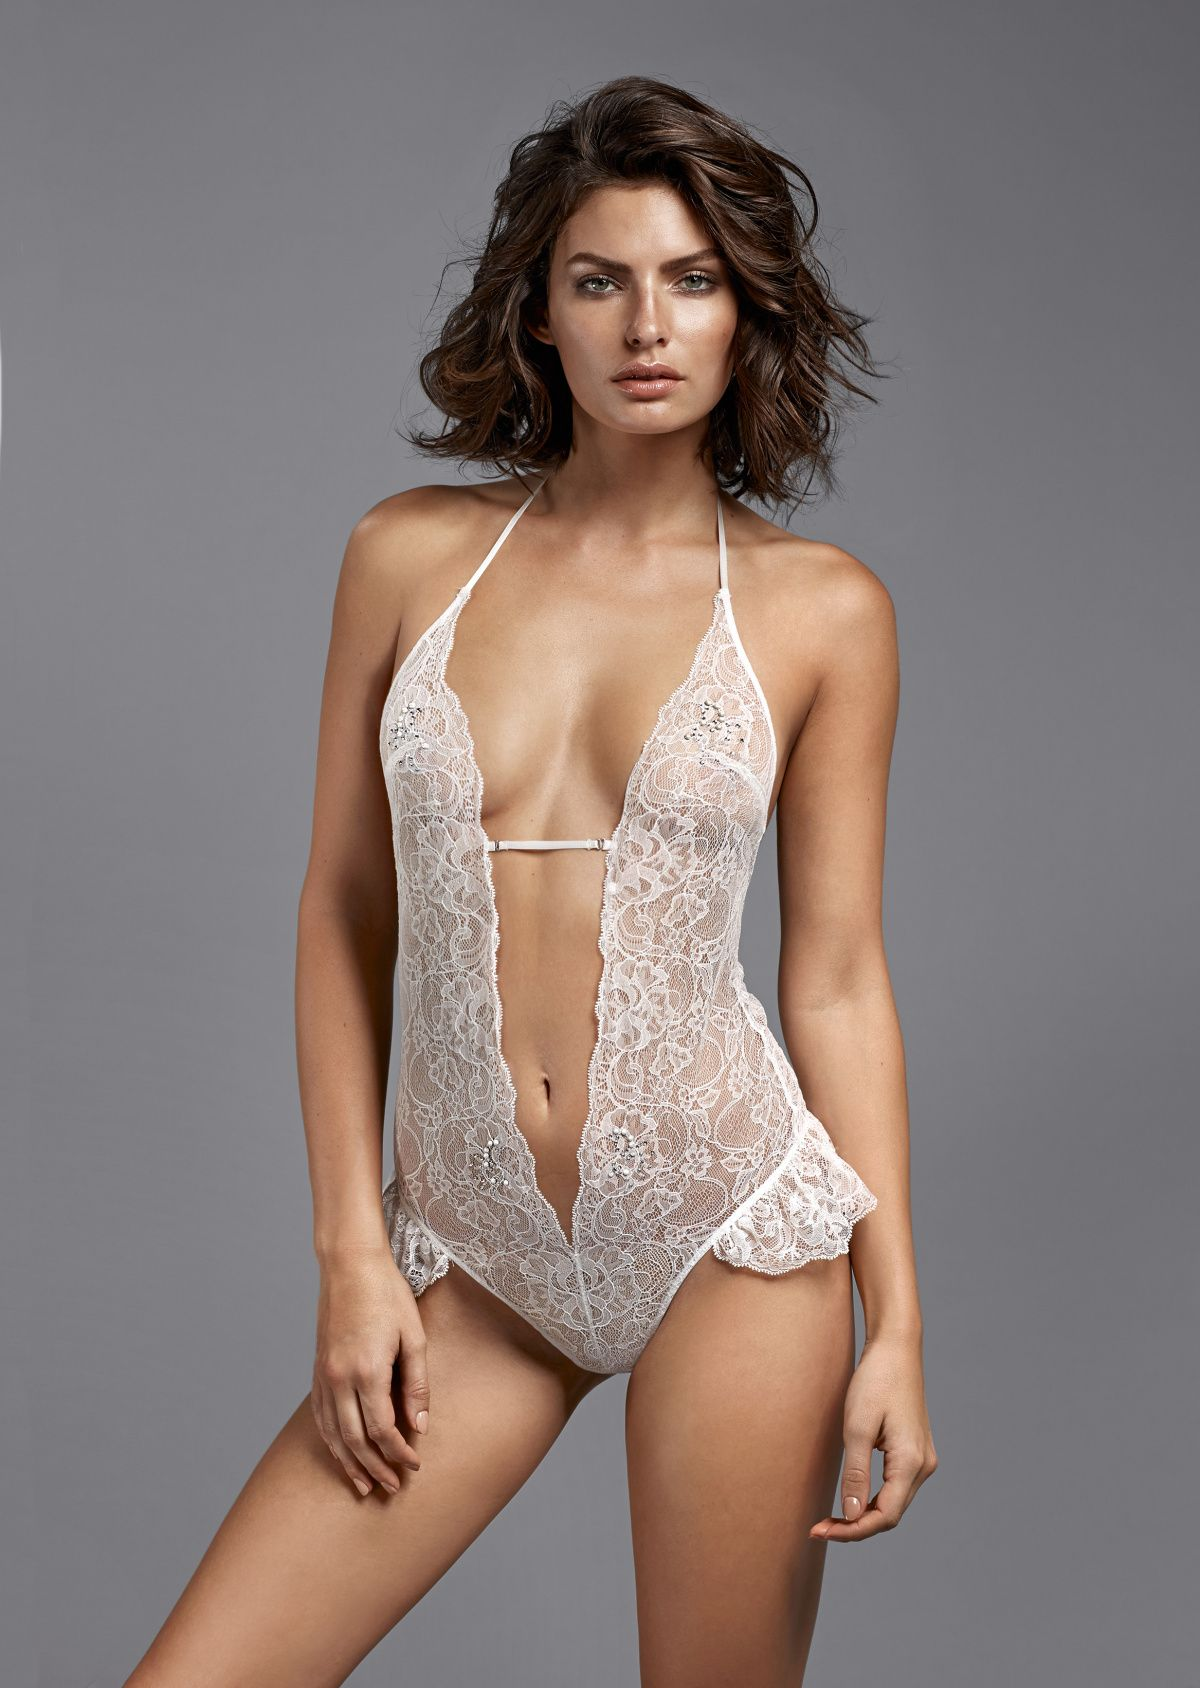 Intimissimi Lingerie SS2014 -- Model: Alyssa Miller   I ...